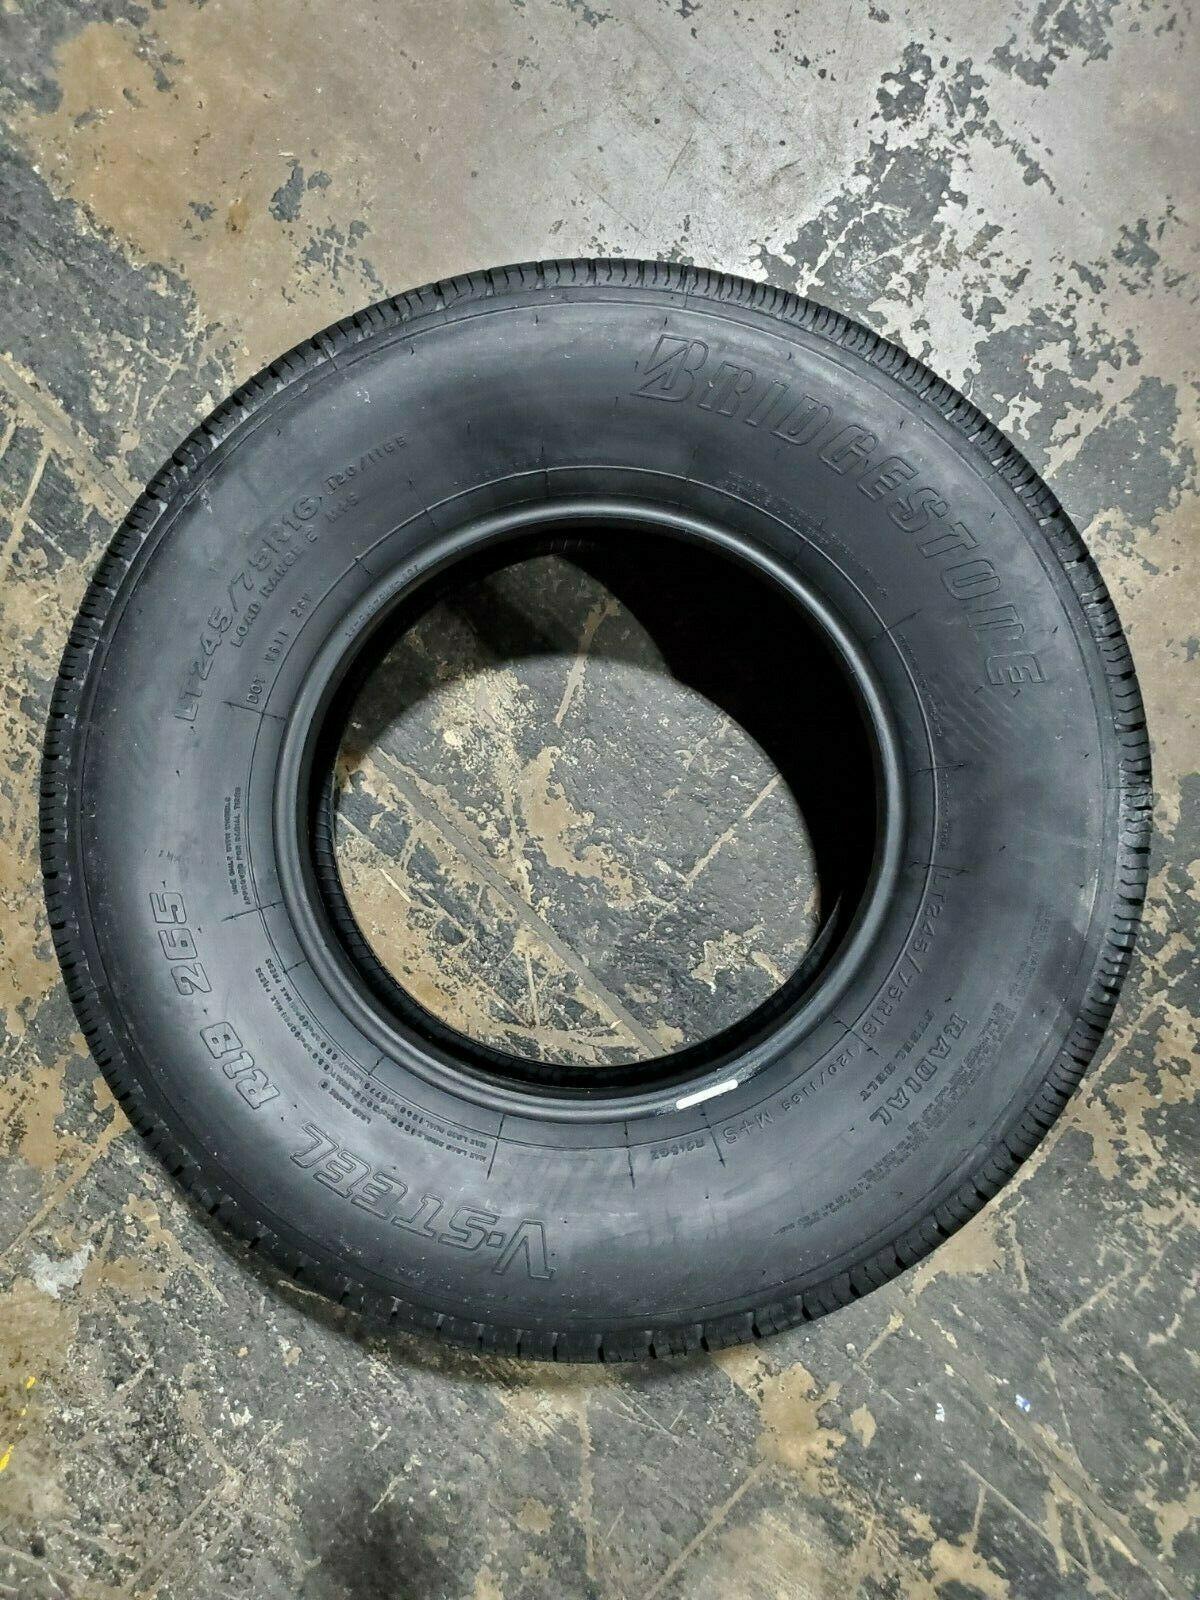 LT245/75R16 Bridgestone V-STEEL RIB 265 120/116S M+S 10PLY LOAD E 80PSI image 3